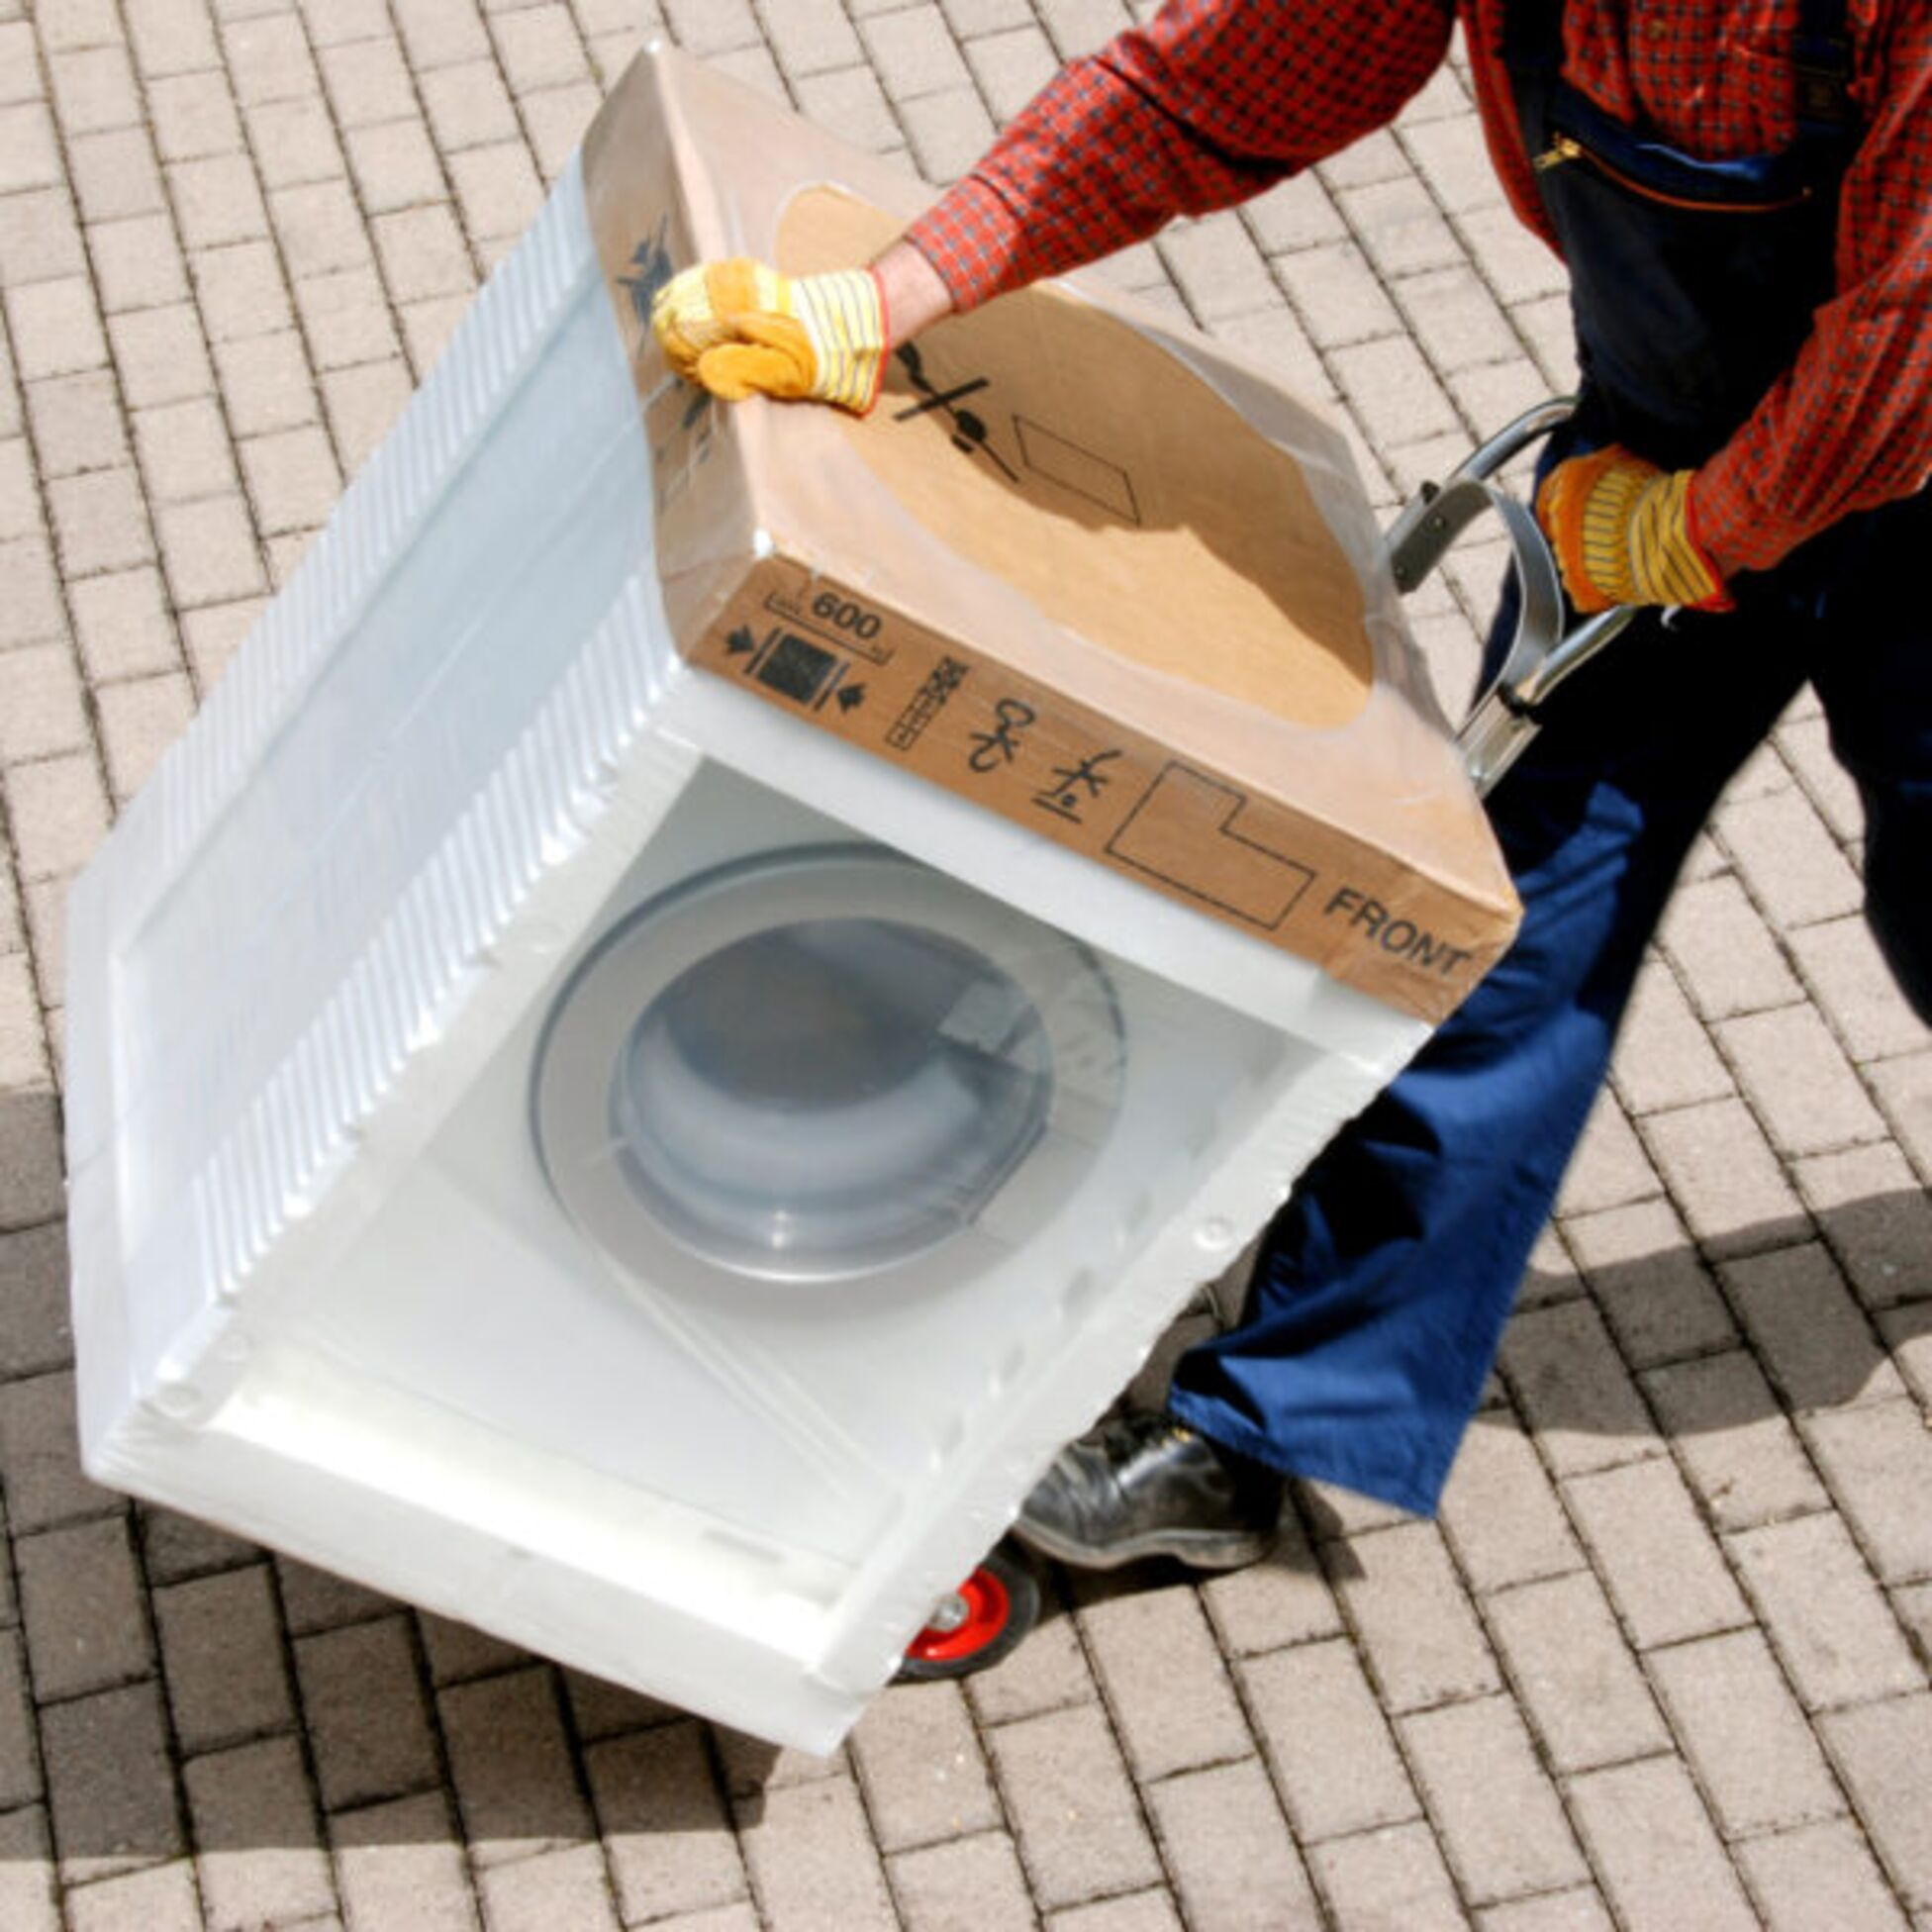 Mann transportiert Waschmaschine bei Umzug auf Sackkarre